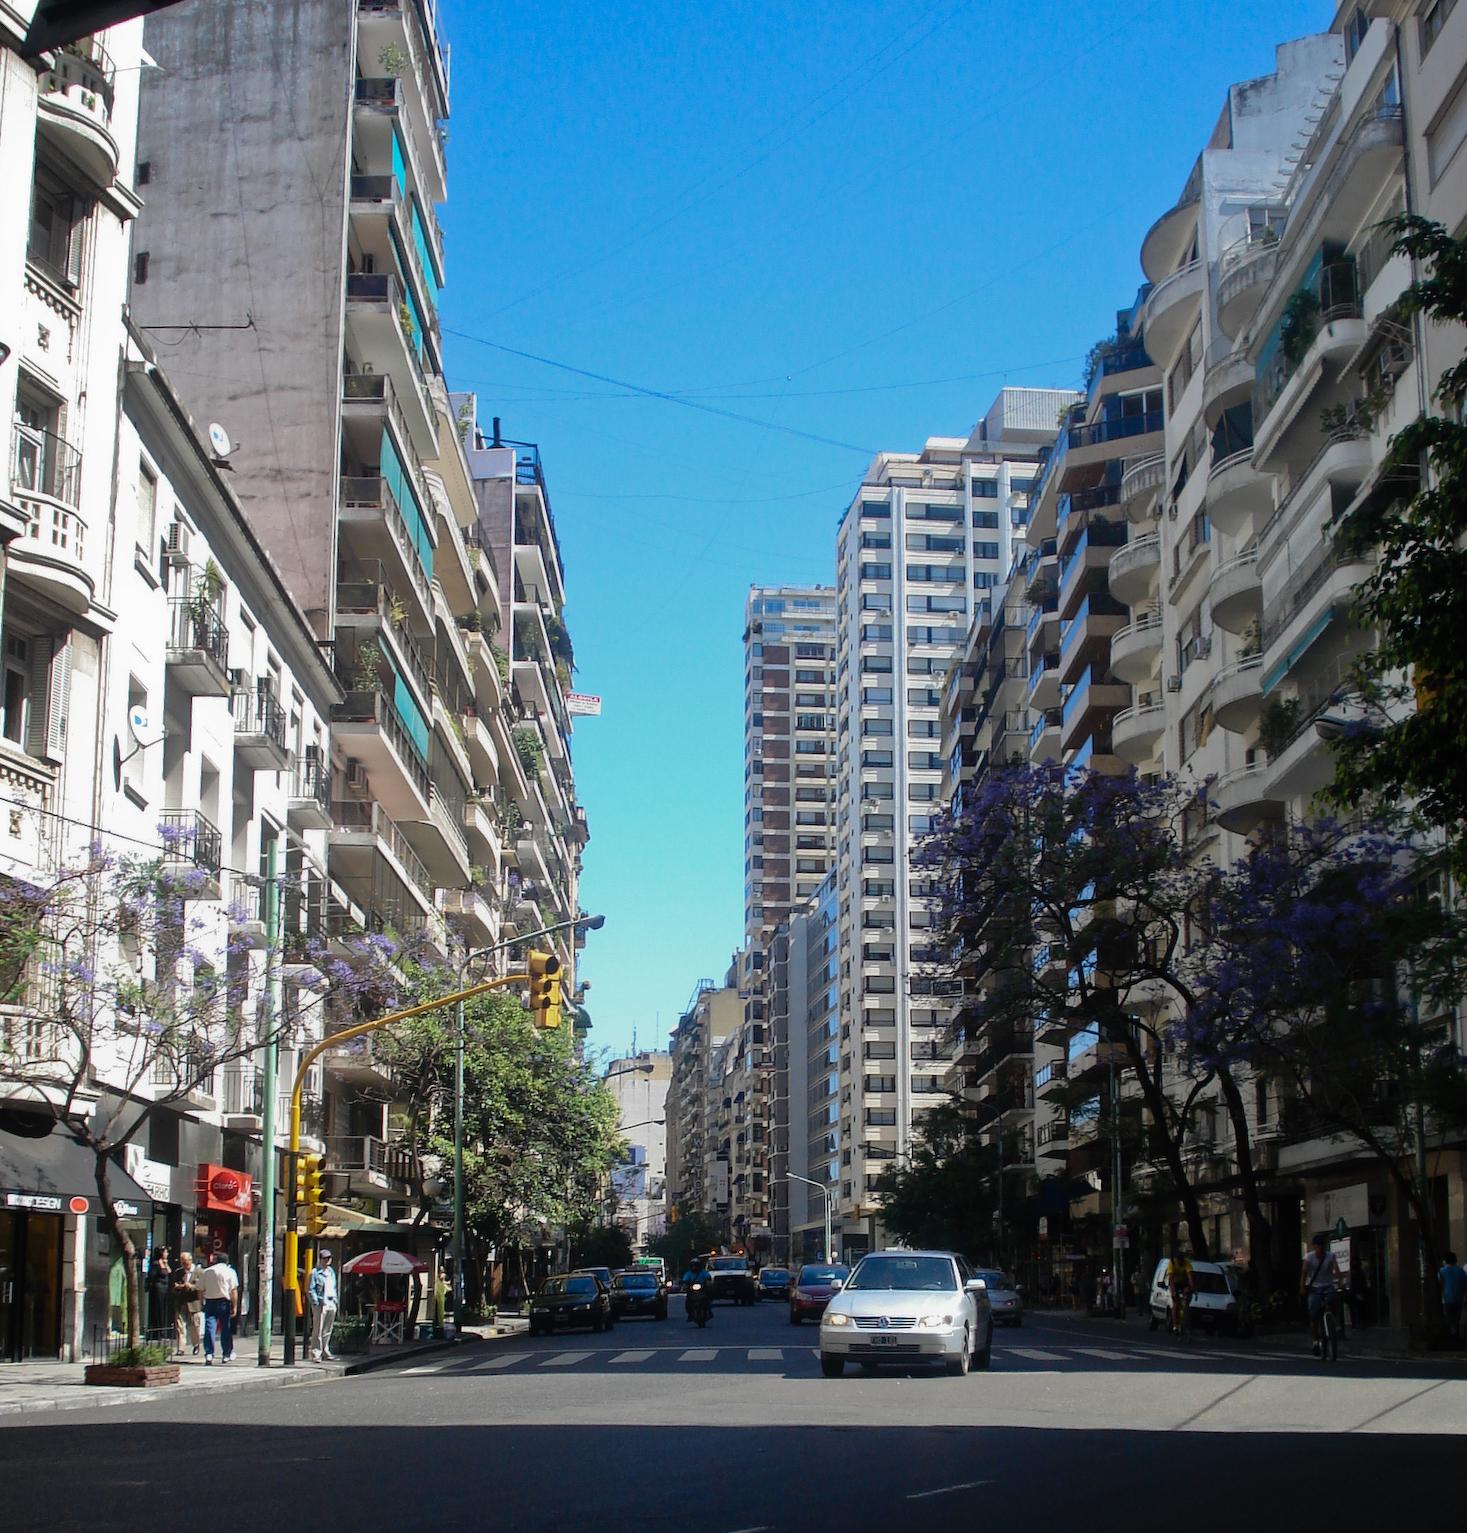 Recoleta buenos aires wikip dia a enciclop dia livre for Hotel buenos aires design recoleta